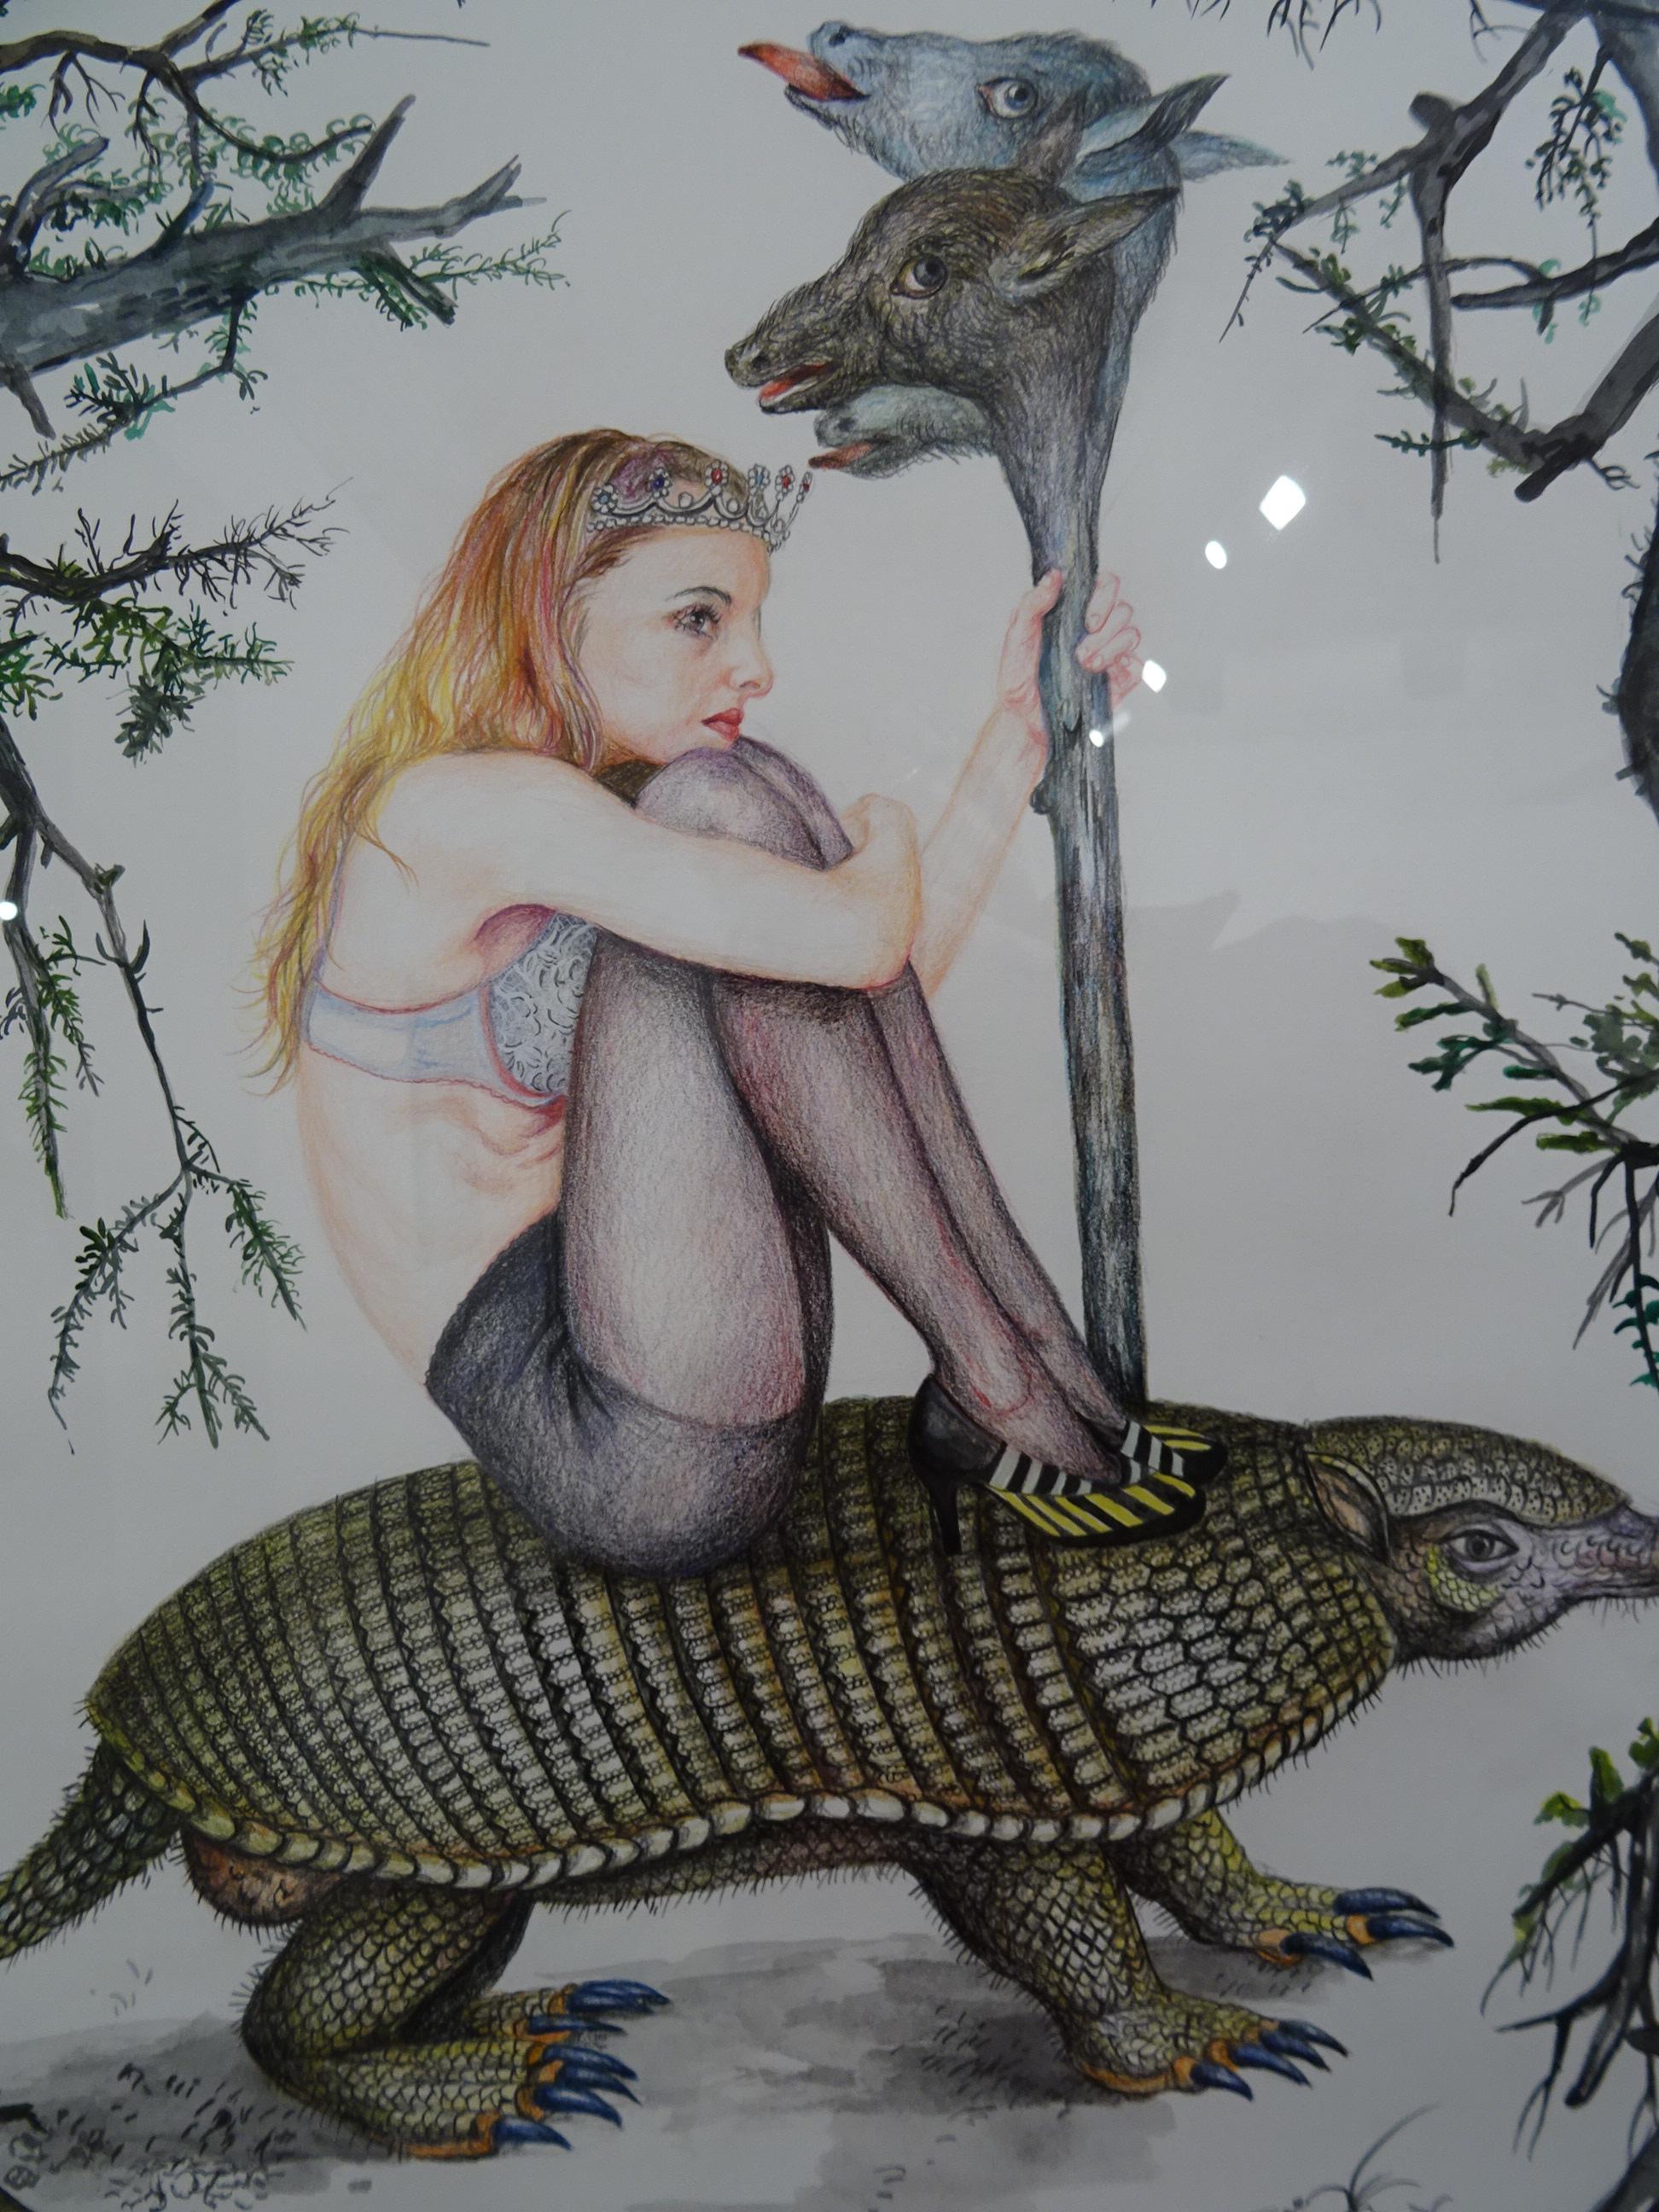 Nazanin Pouyandeh s'expose (à nu ?) à La Fabric - Annecy